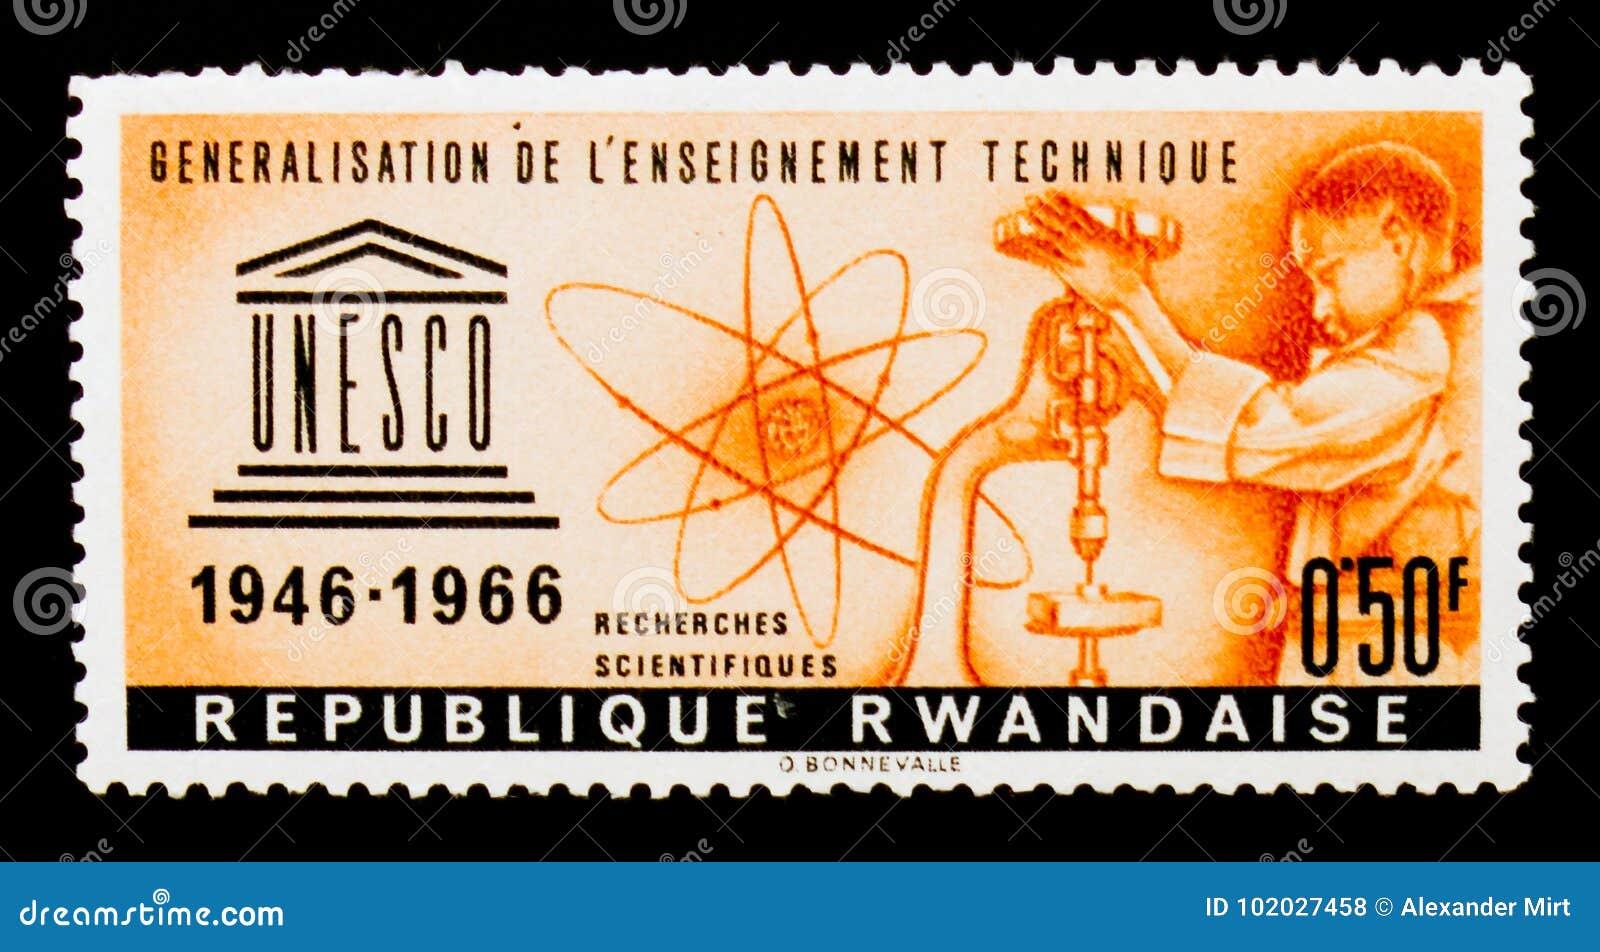 Generalization Of The Education Technics, UNESCO 20th